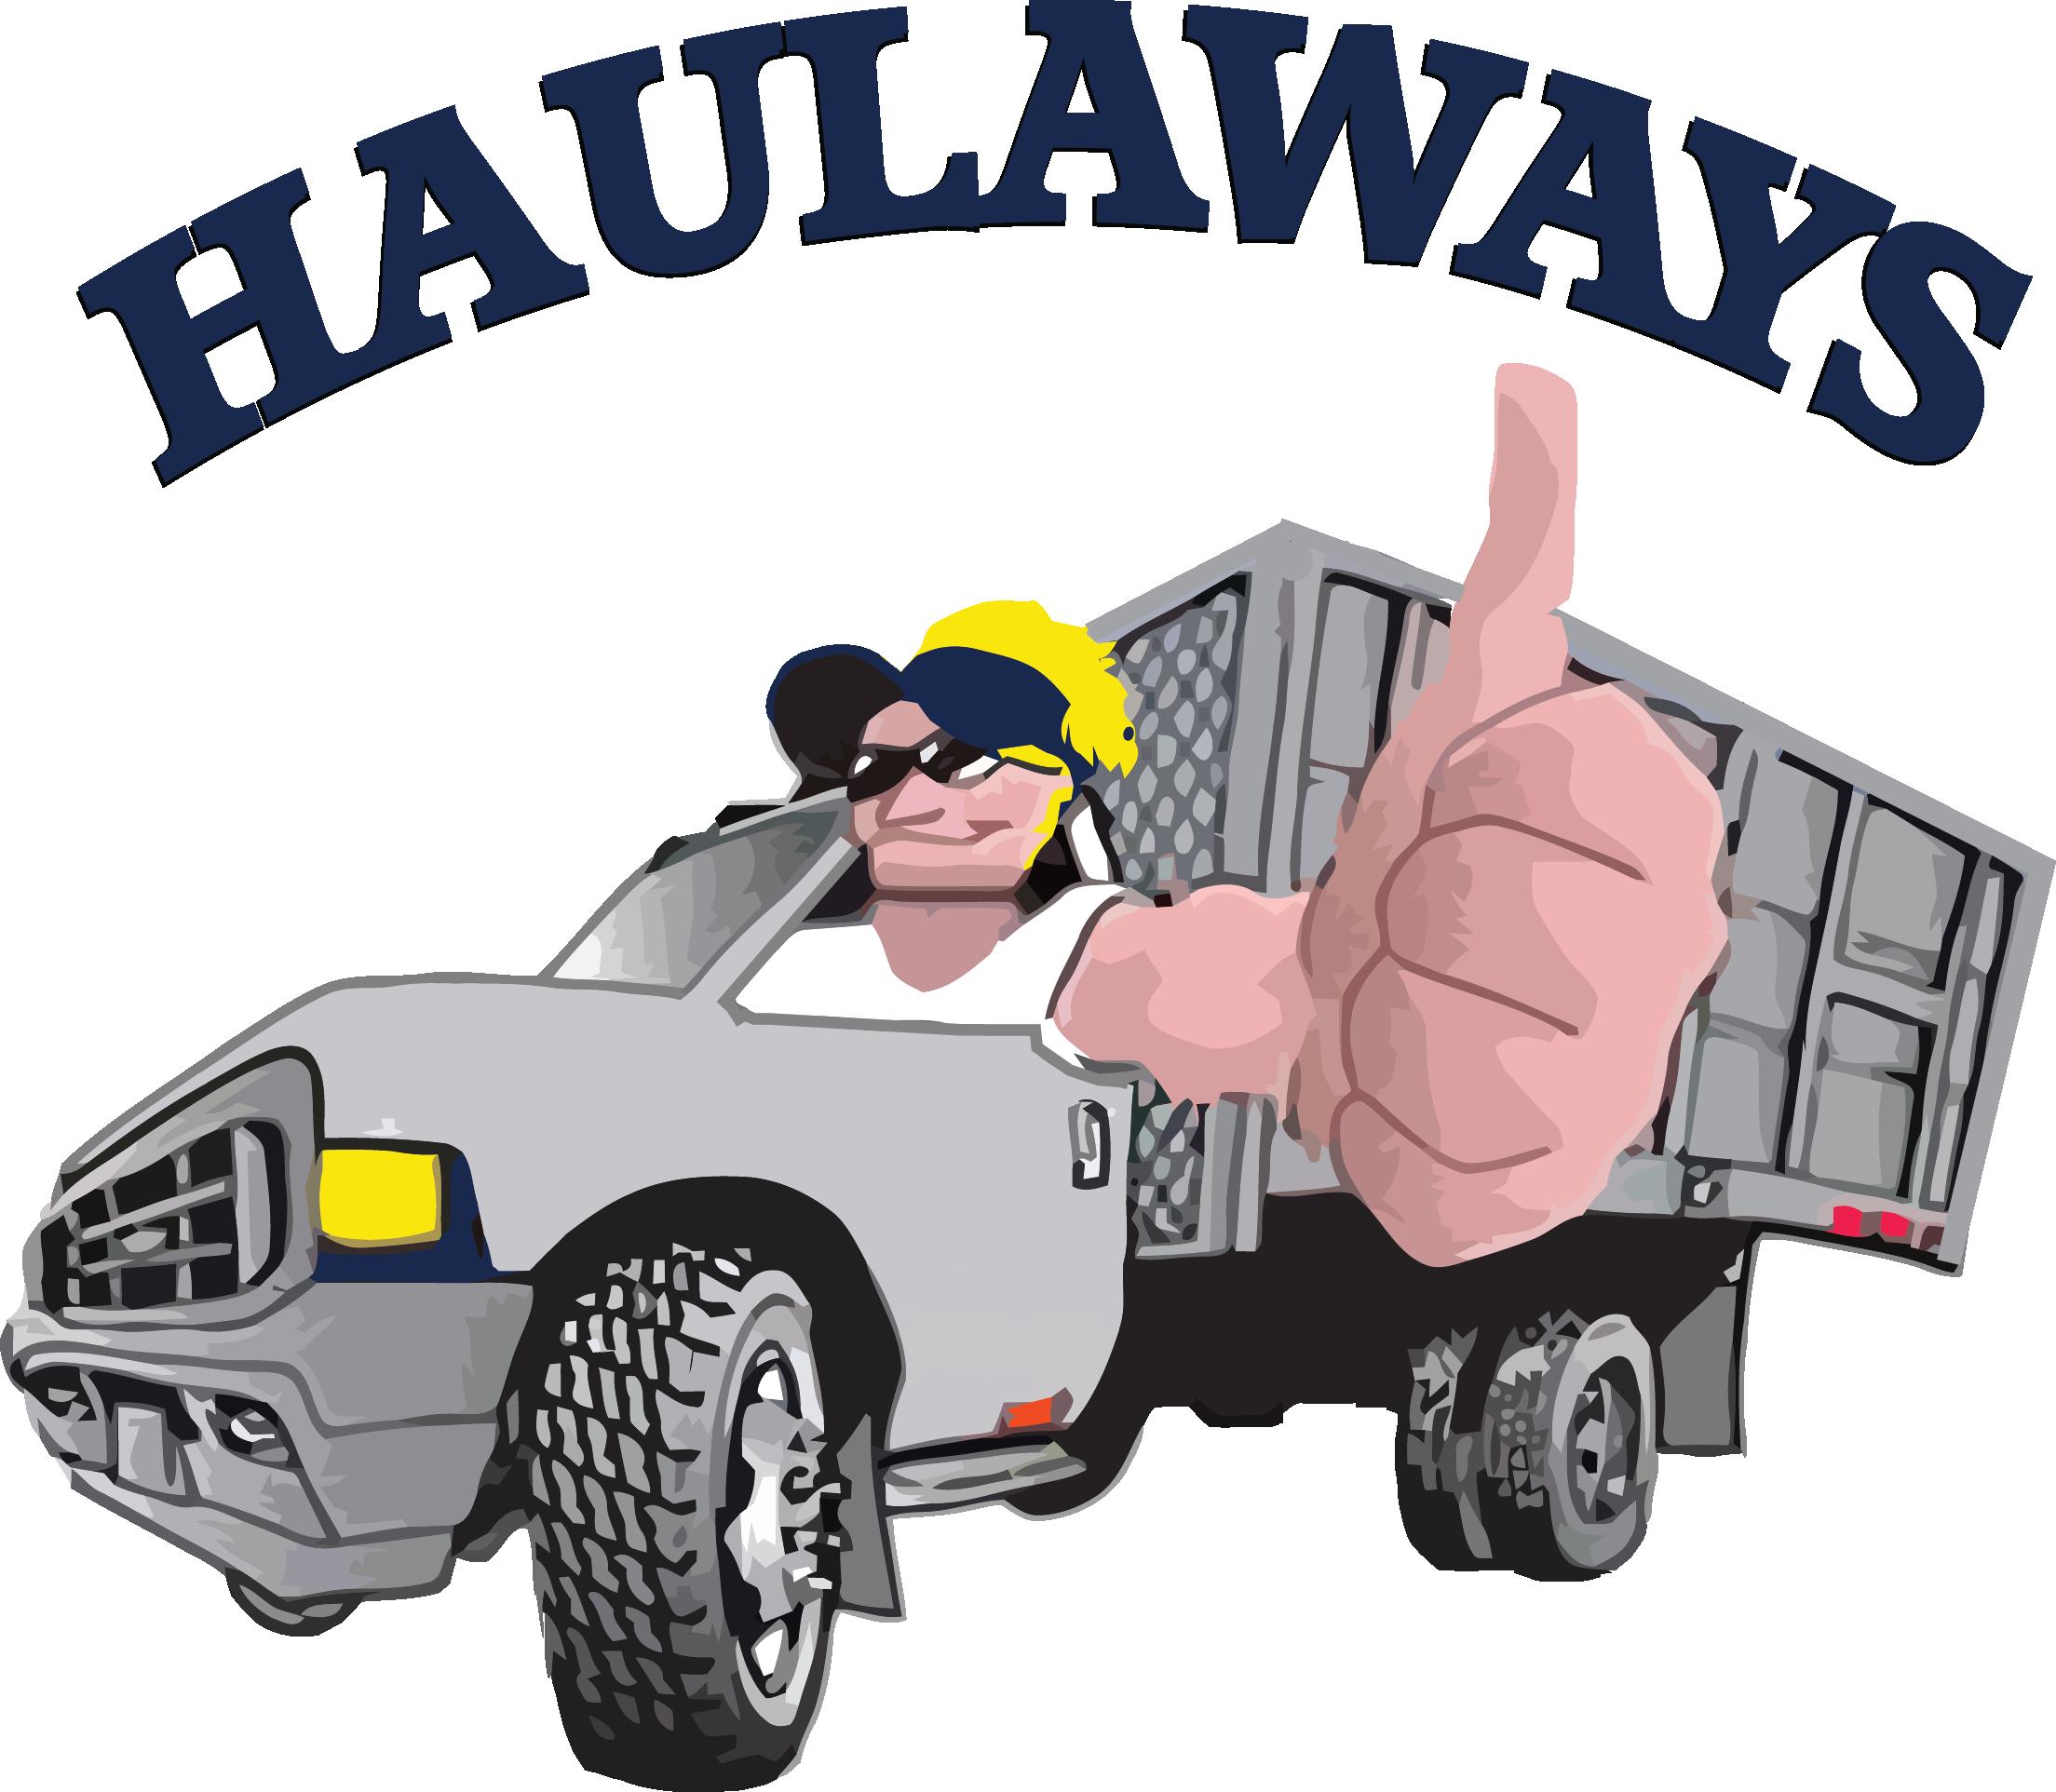 Car hauler clipart jpg transparent Haulaways - Junk Removal in Tulsa - Fast Junk Removal Service ... jpg transparent